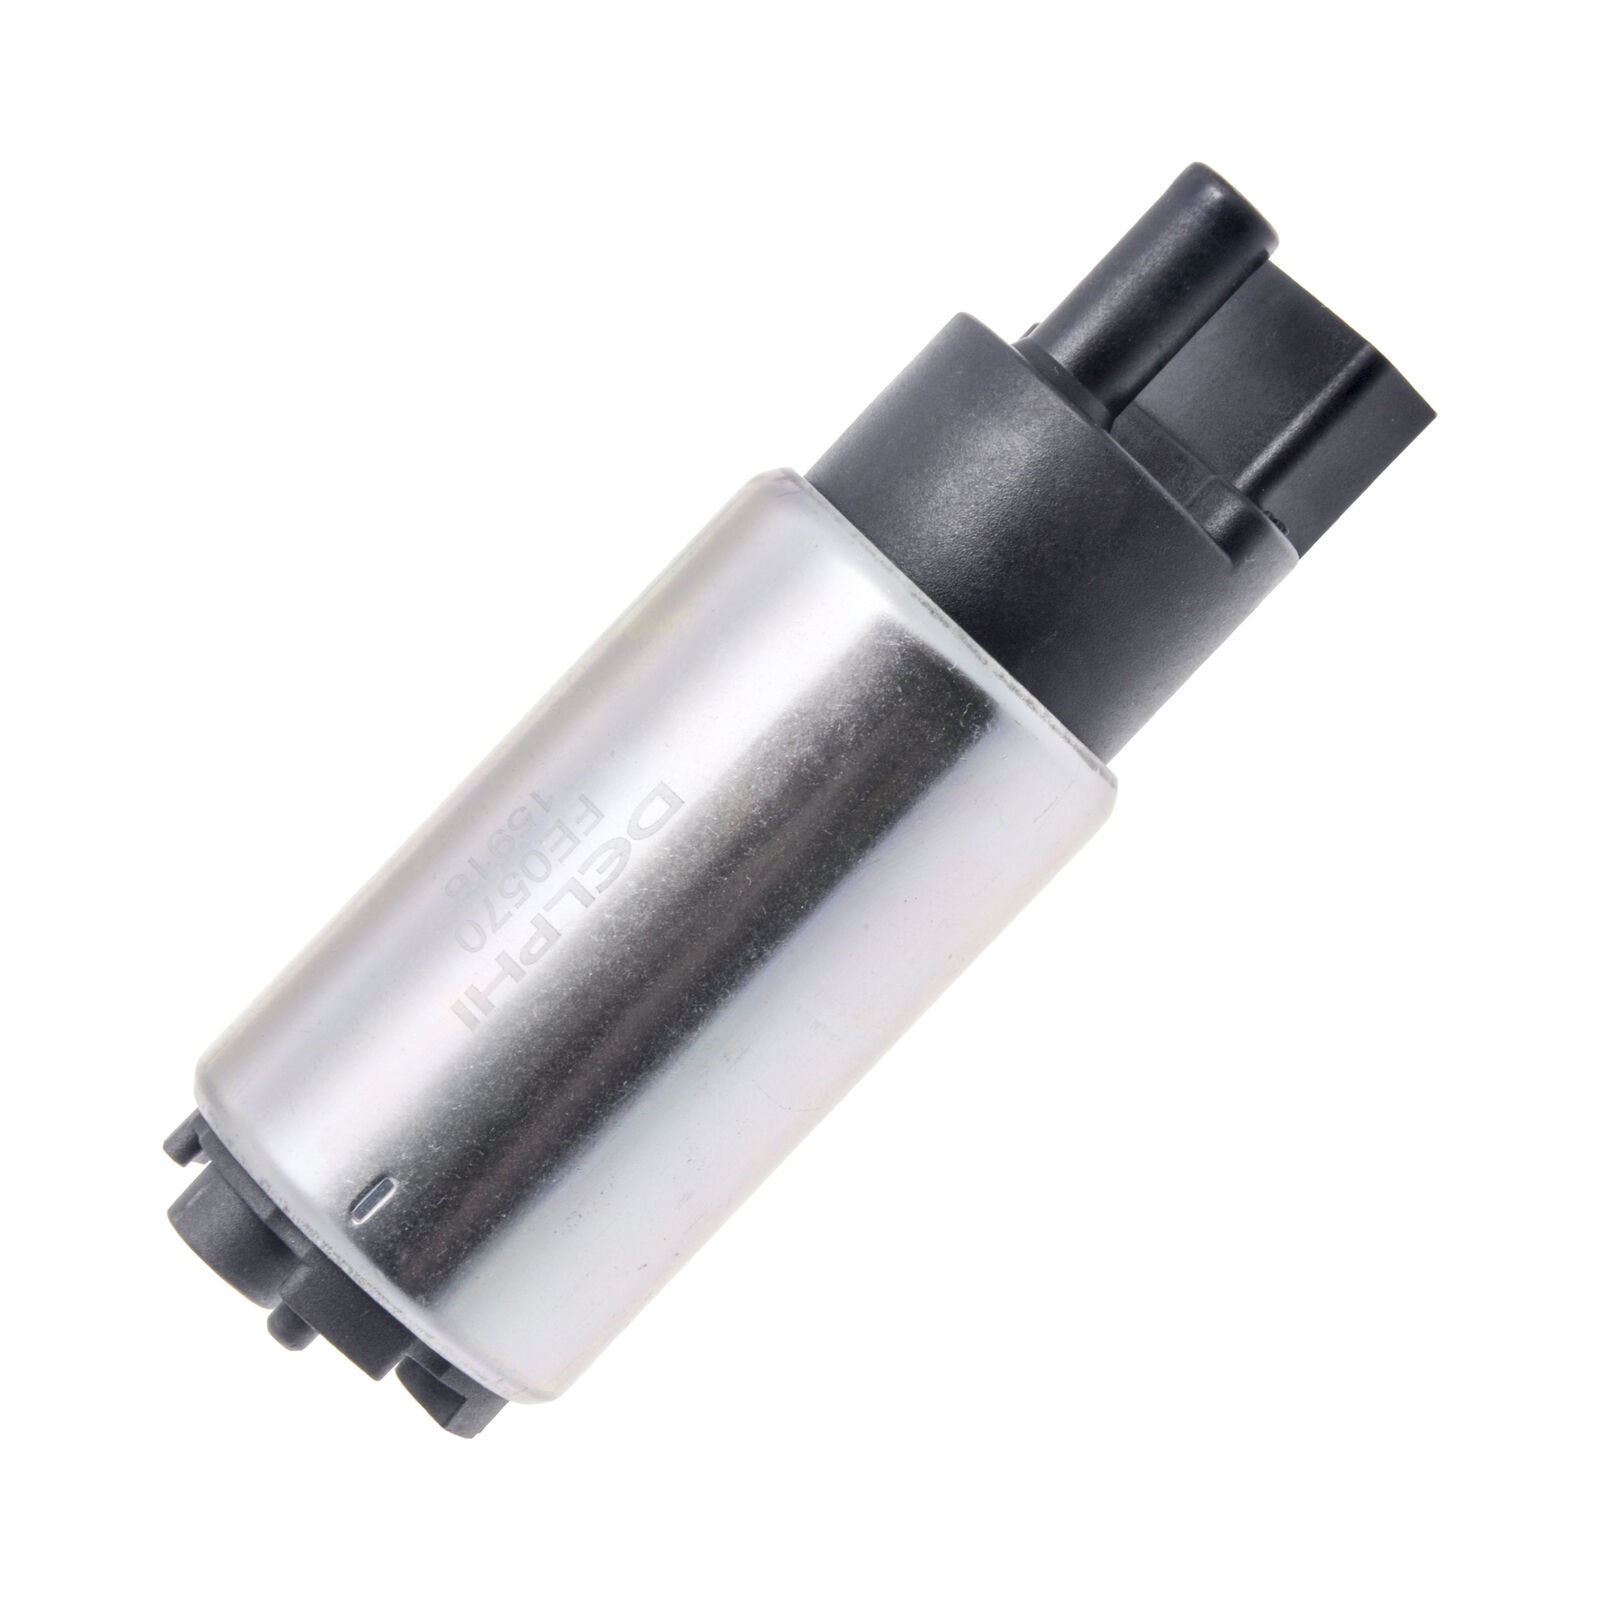 Bosch Electric Fuel Pump Kit BO38-K9204 For Nissan 1995-2011